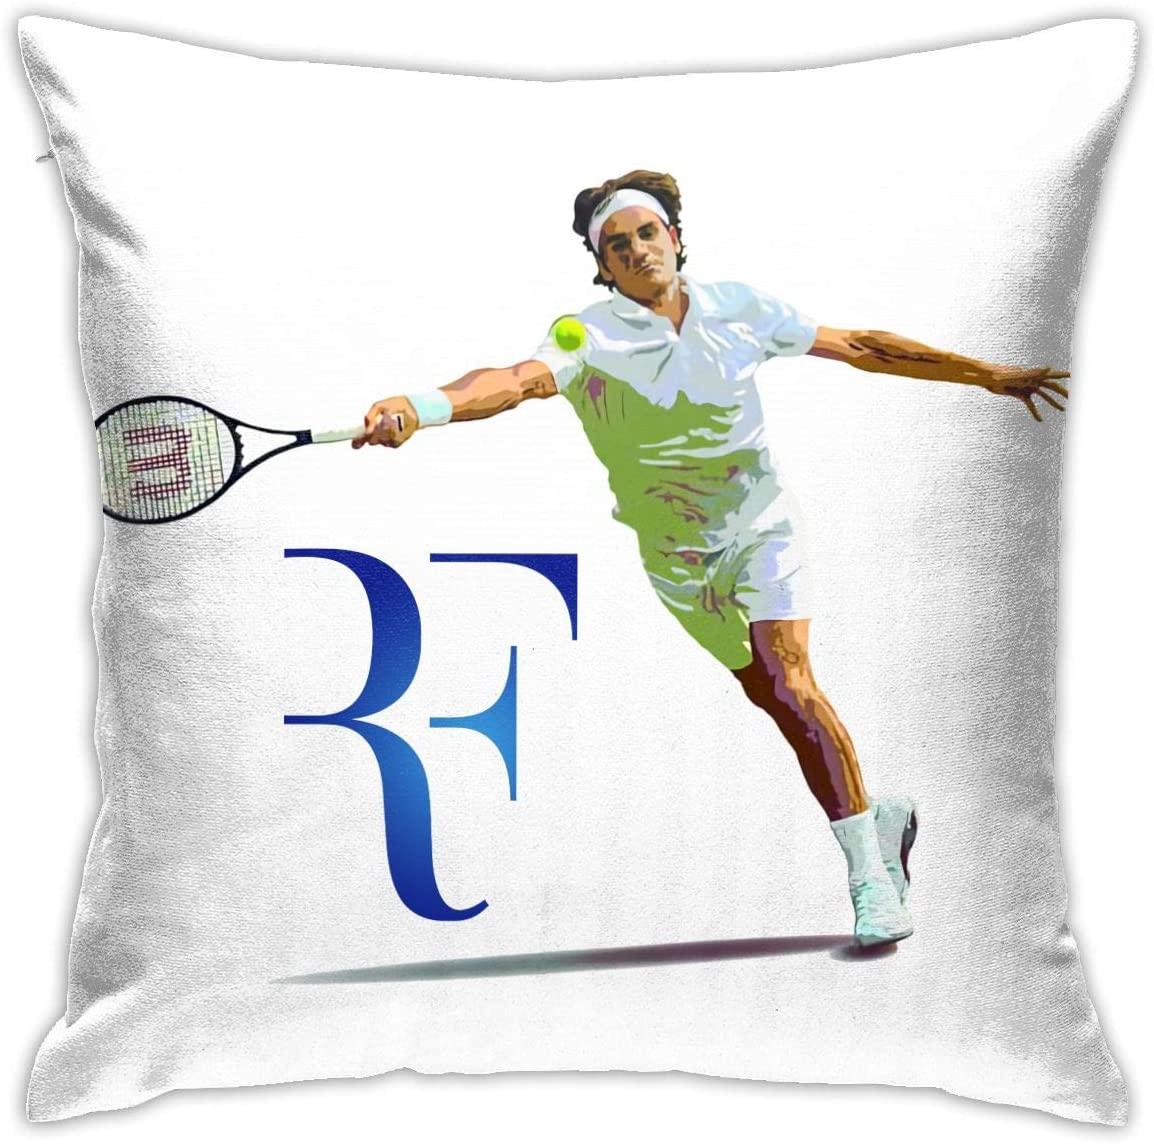 JeccLife Roger Federer Pillowcase Cushion Cover for Sofa 18 X 18 Sofa Pillow Case Decoration Home Deco